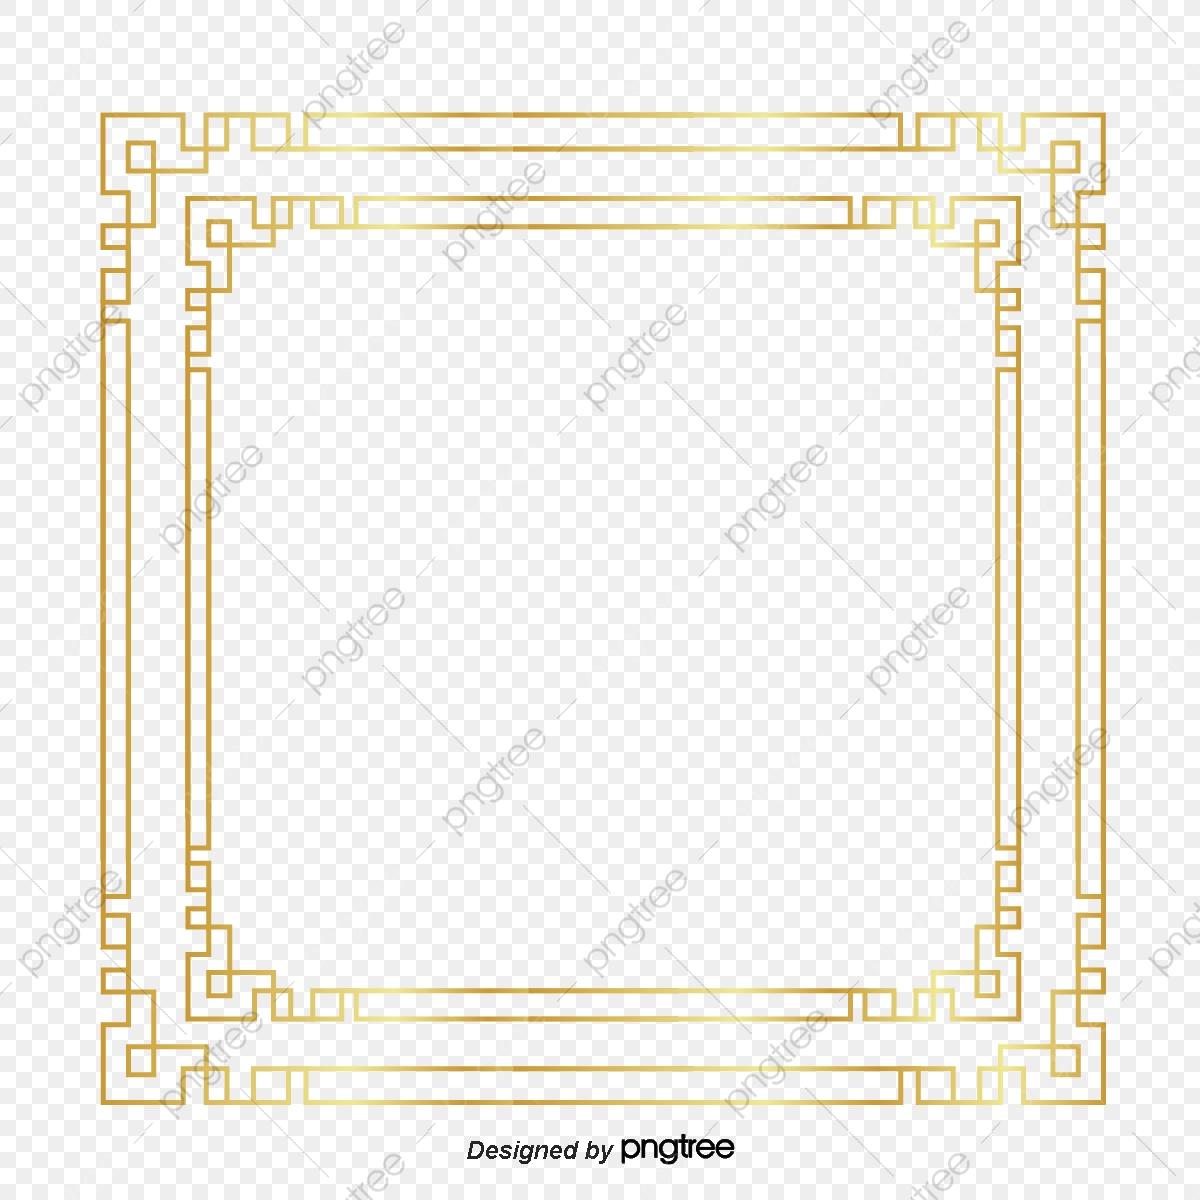 Golden Gradient Border Design For Chinese Wind Border